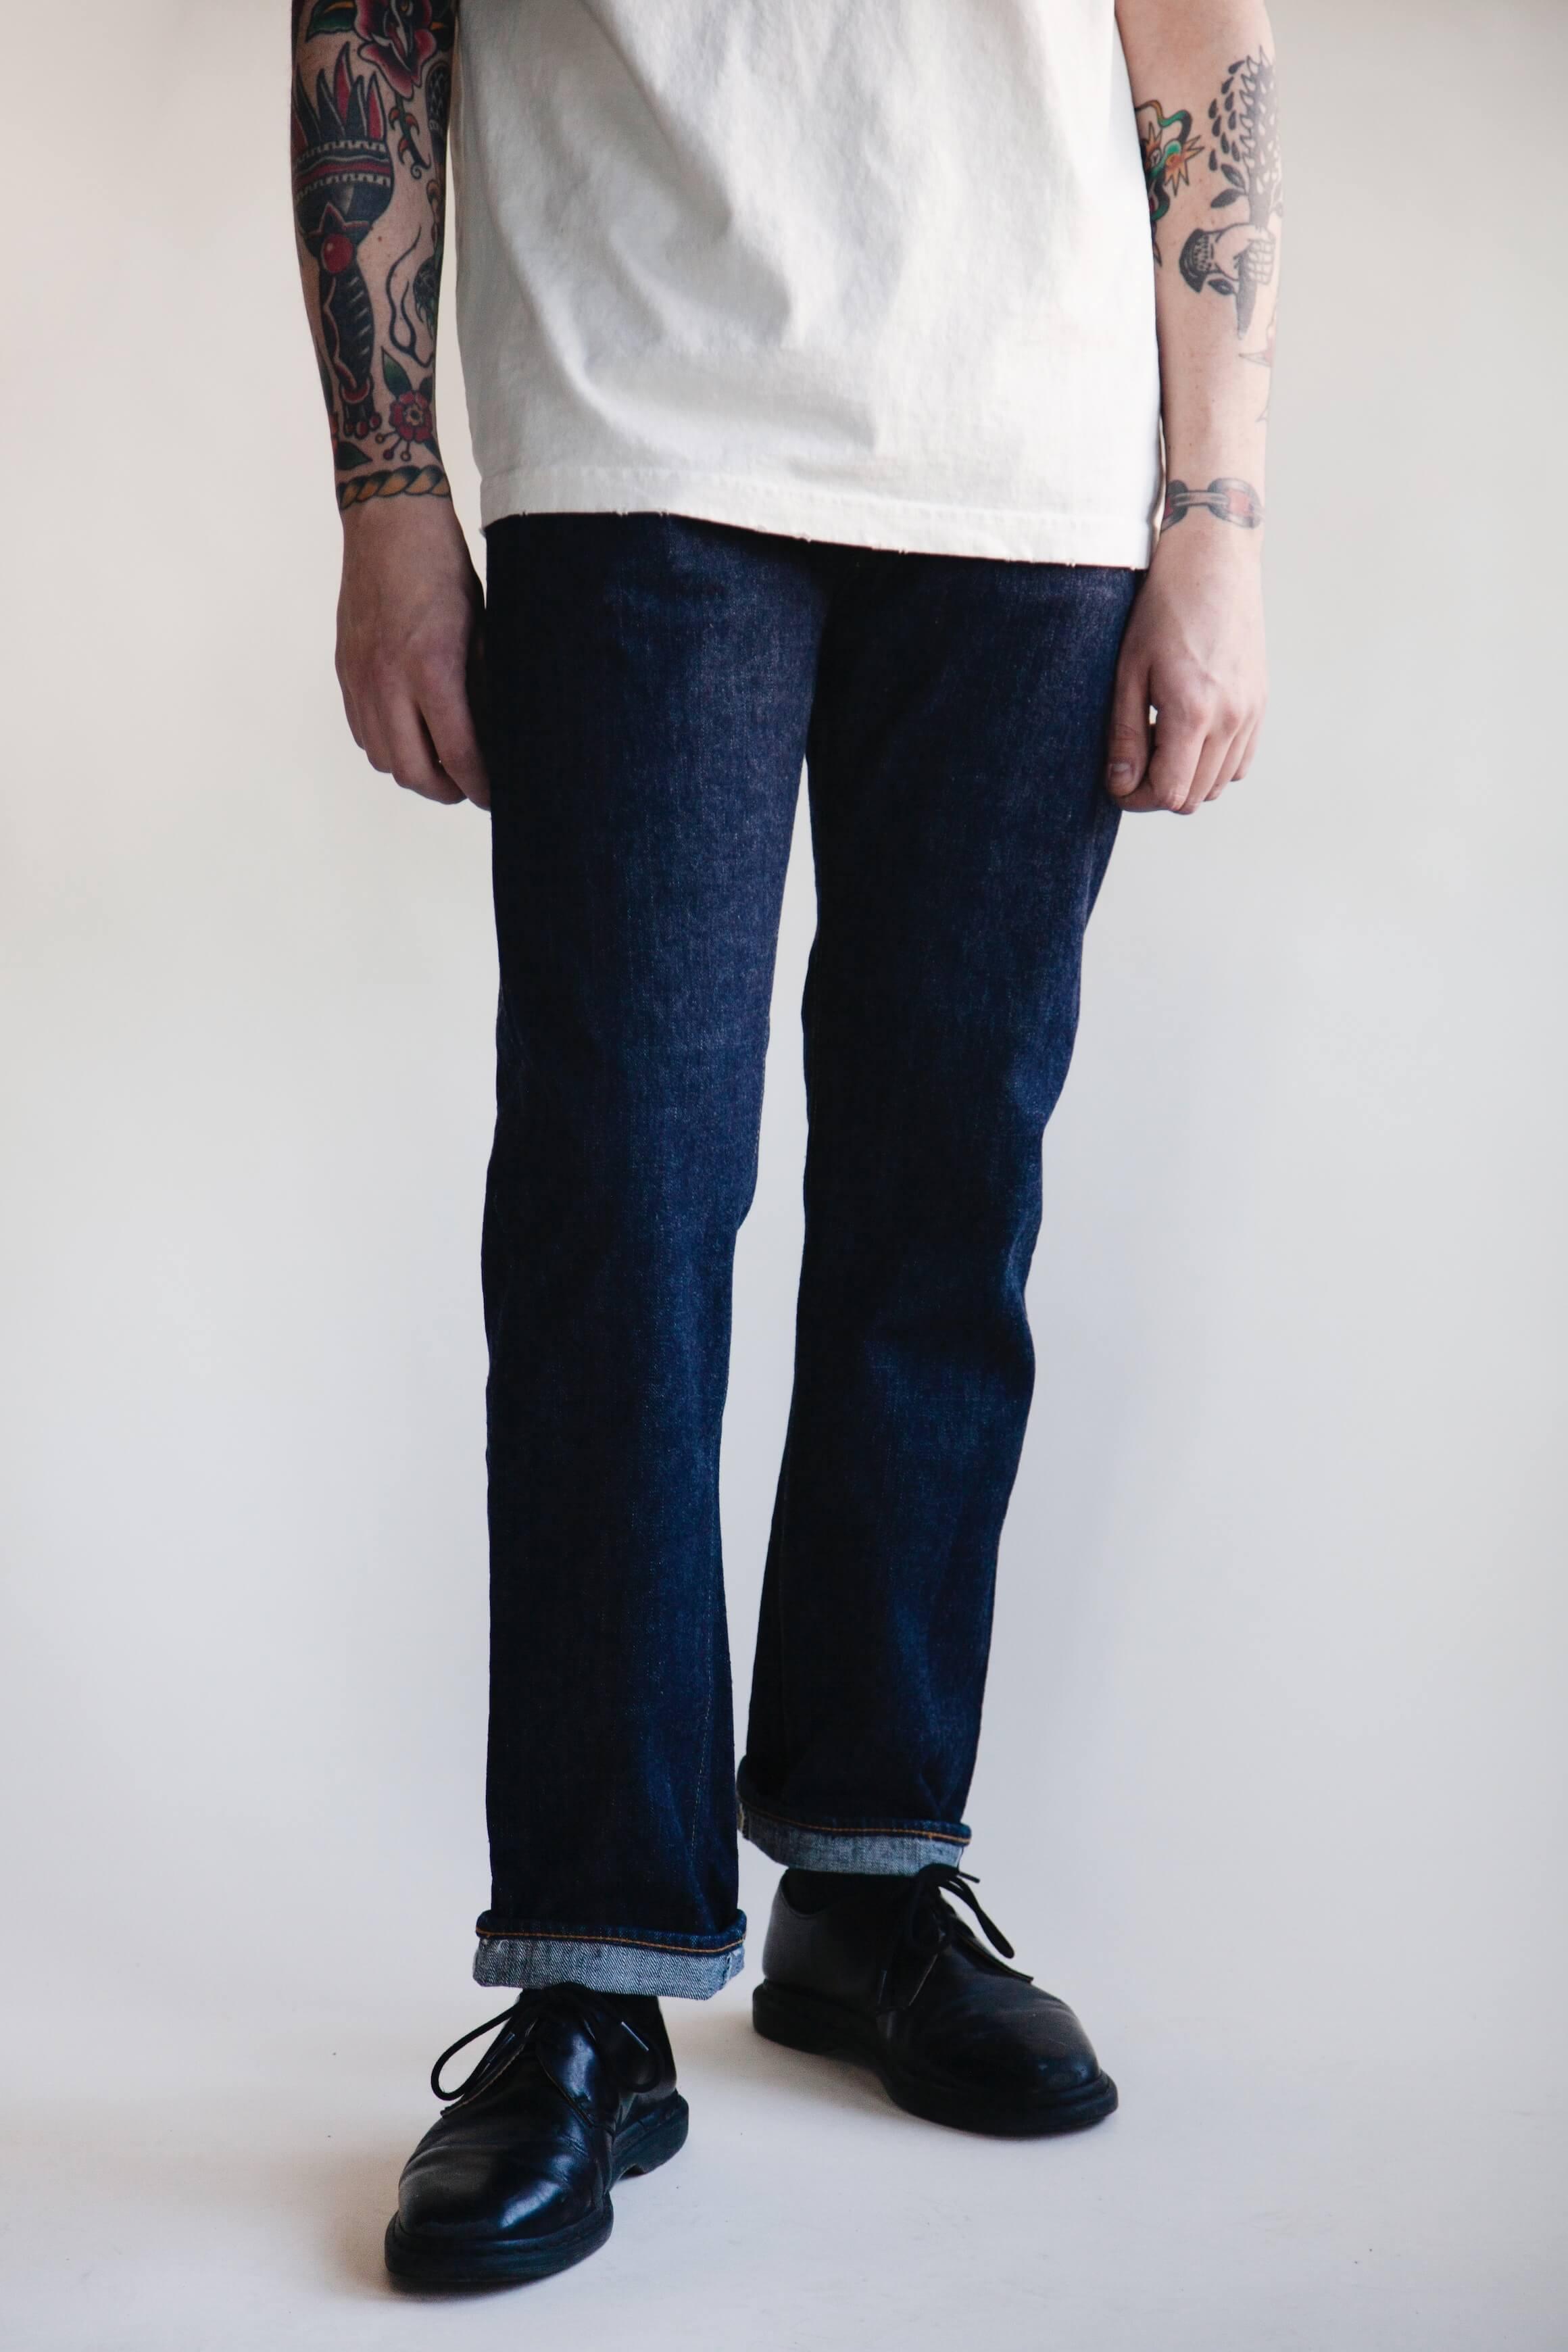 orslow 107 Ivy Denim - one wash on male model